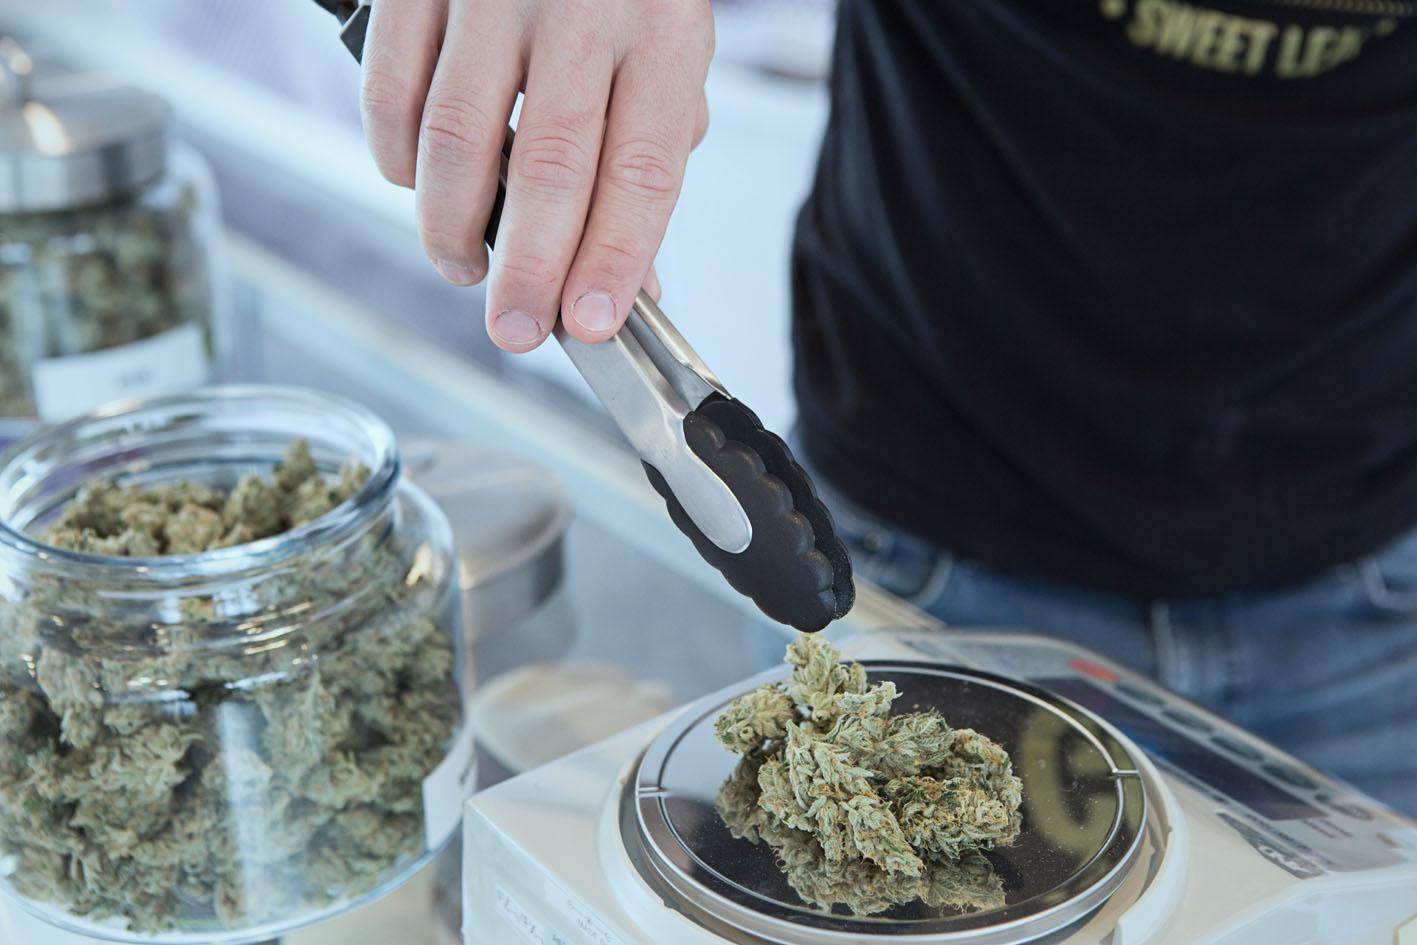 pesando marihuana